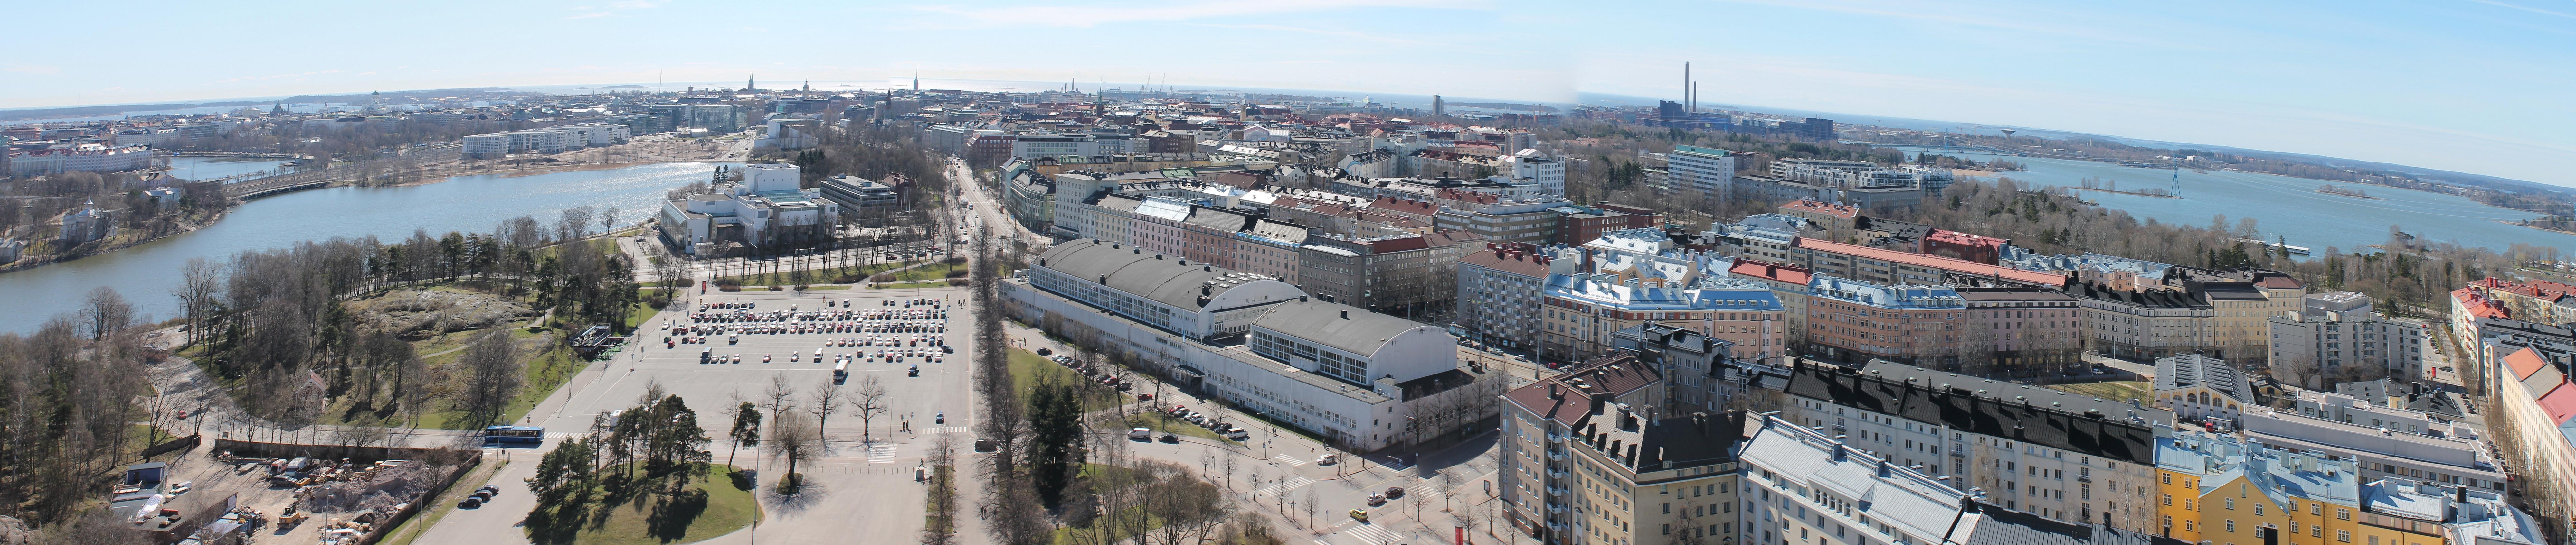 helsinki_panorama_2.jpg